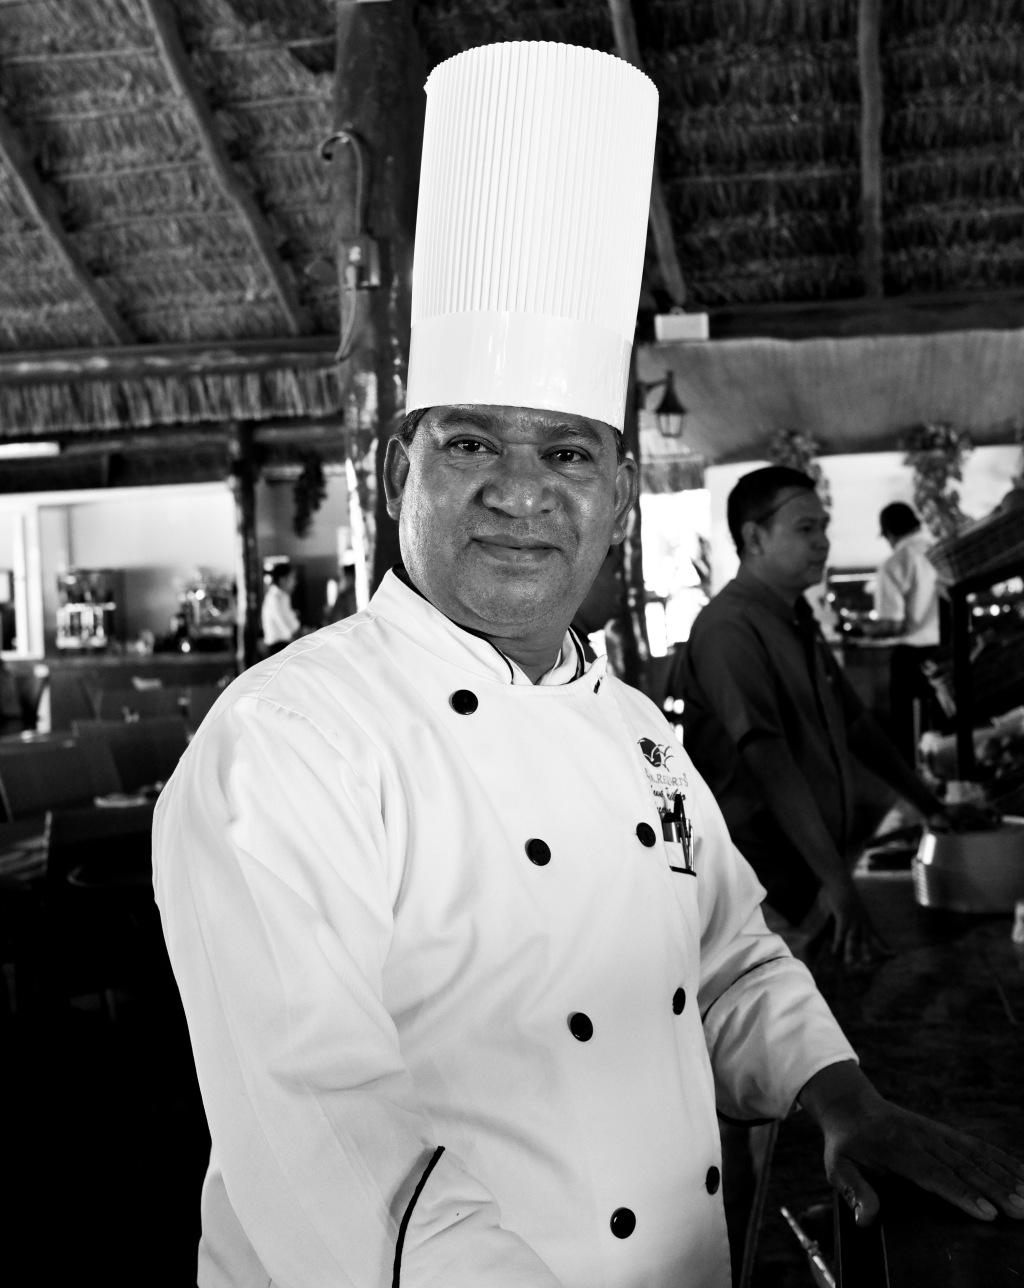 Chef_022017_DSCF3990